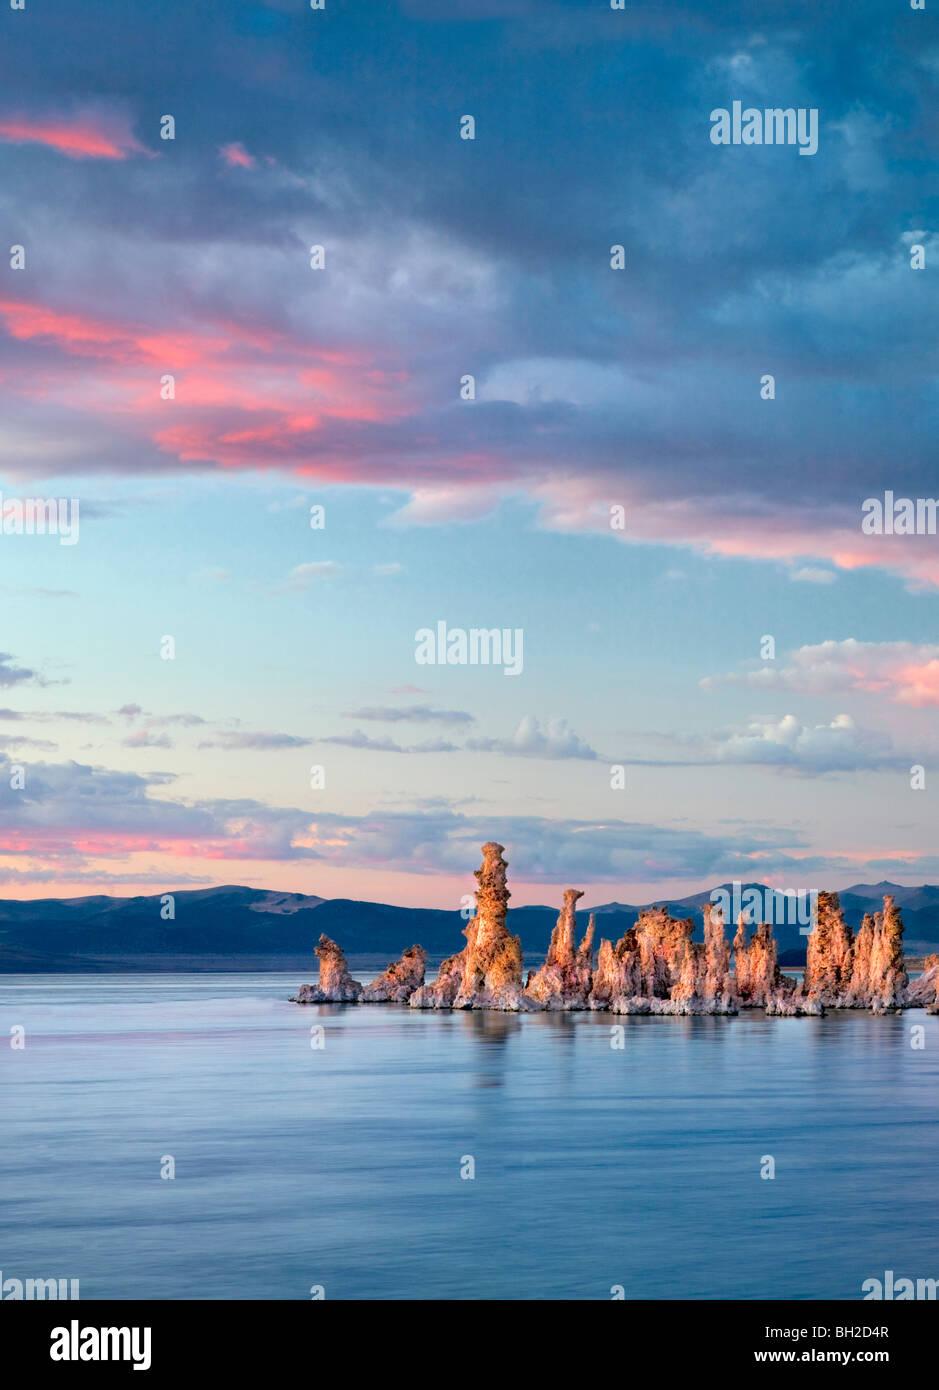 Tufa and sunset. Mono Lake, California - Stock Image